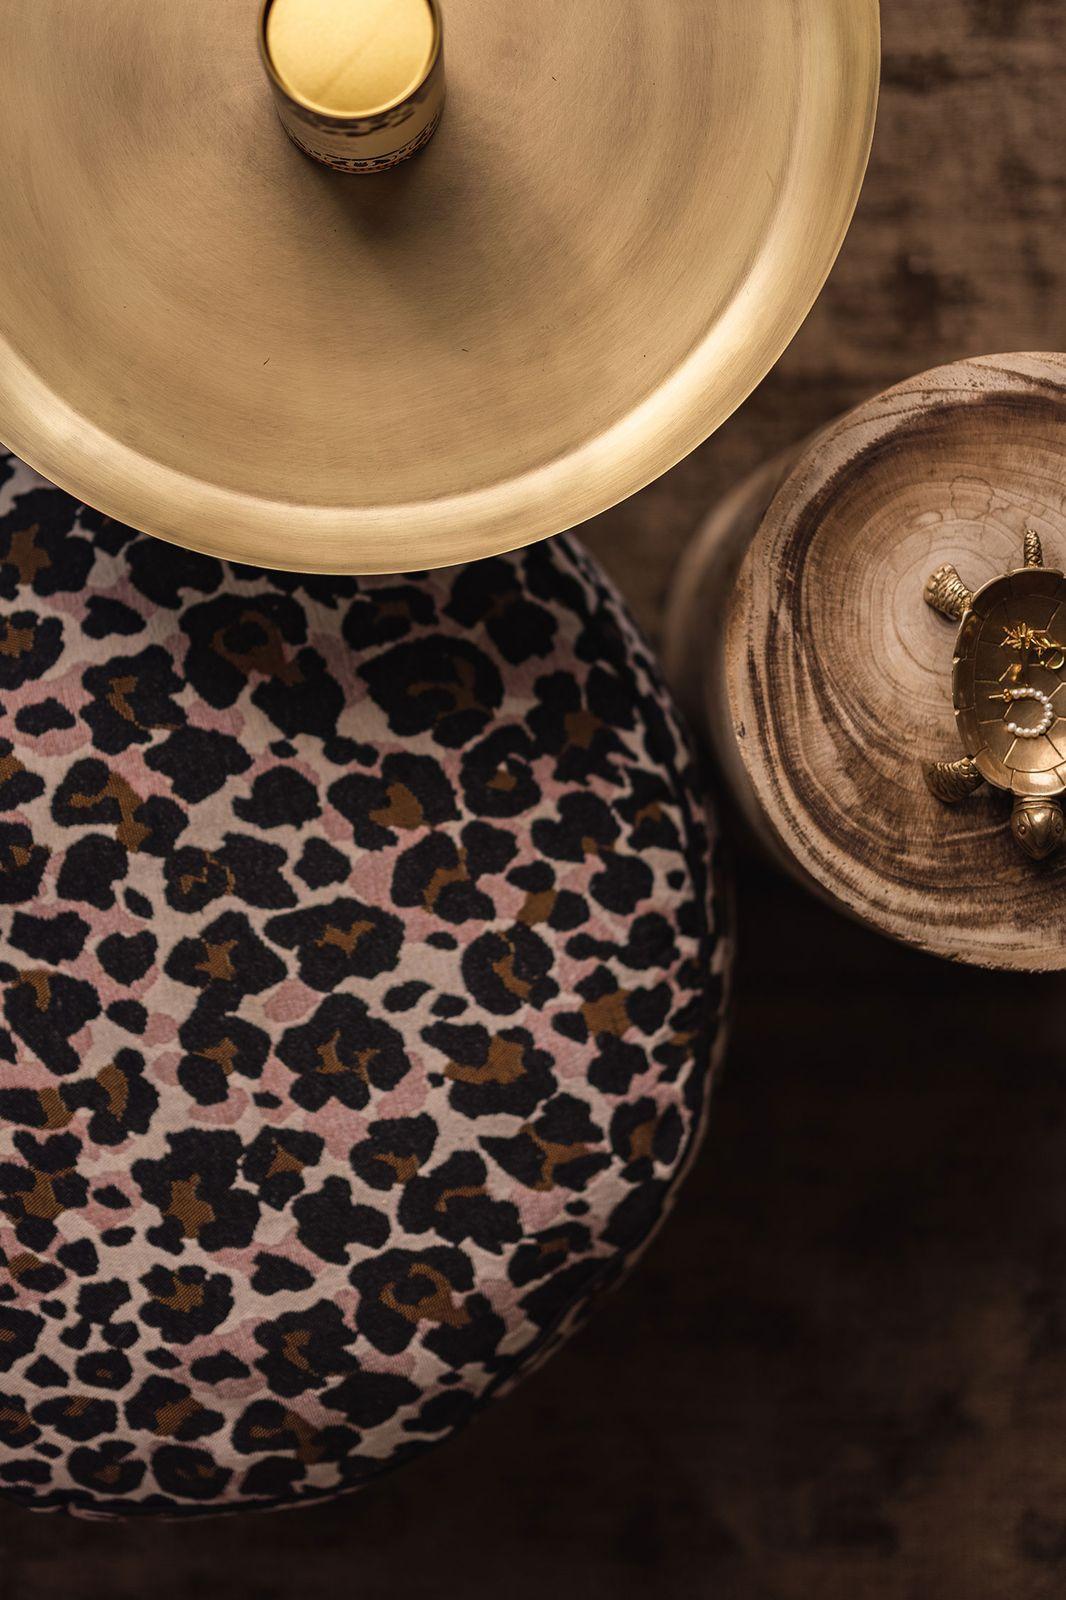 De Huismuts x Sissy-Boy poef leopard - Homeland | Sissy-Boy